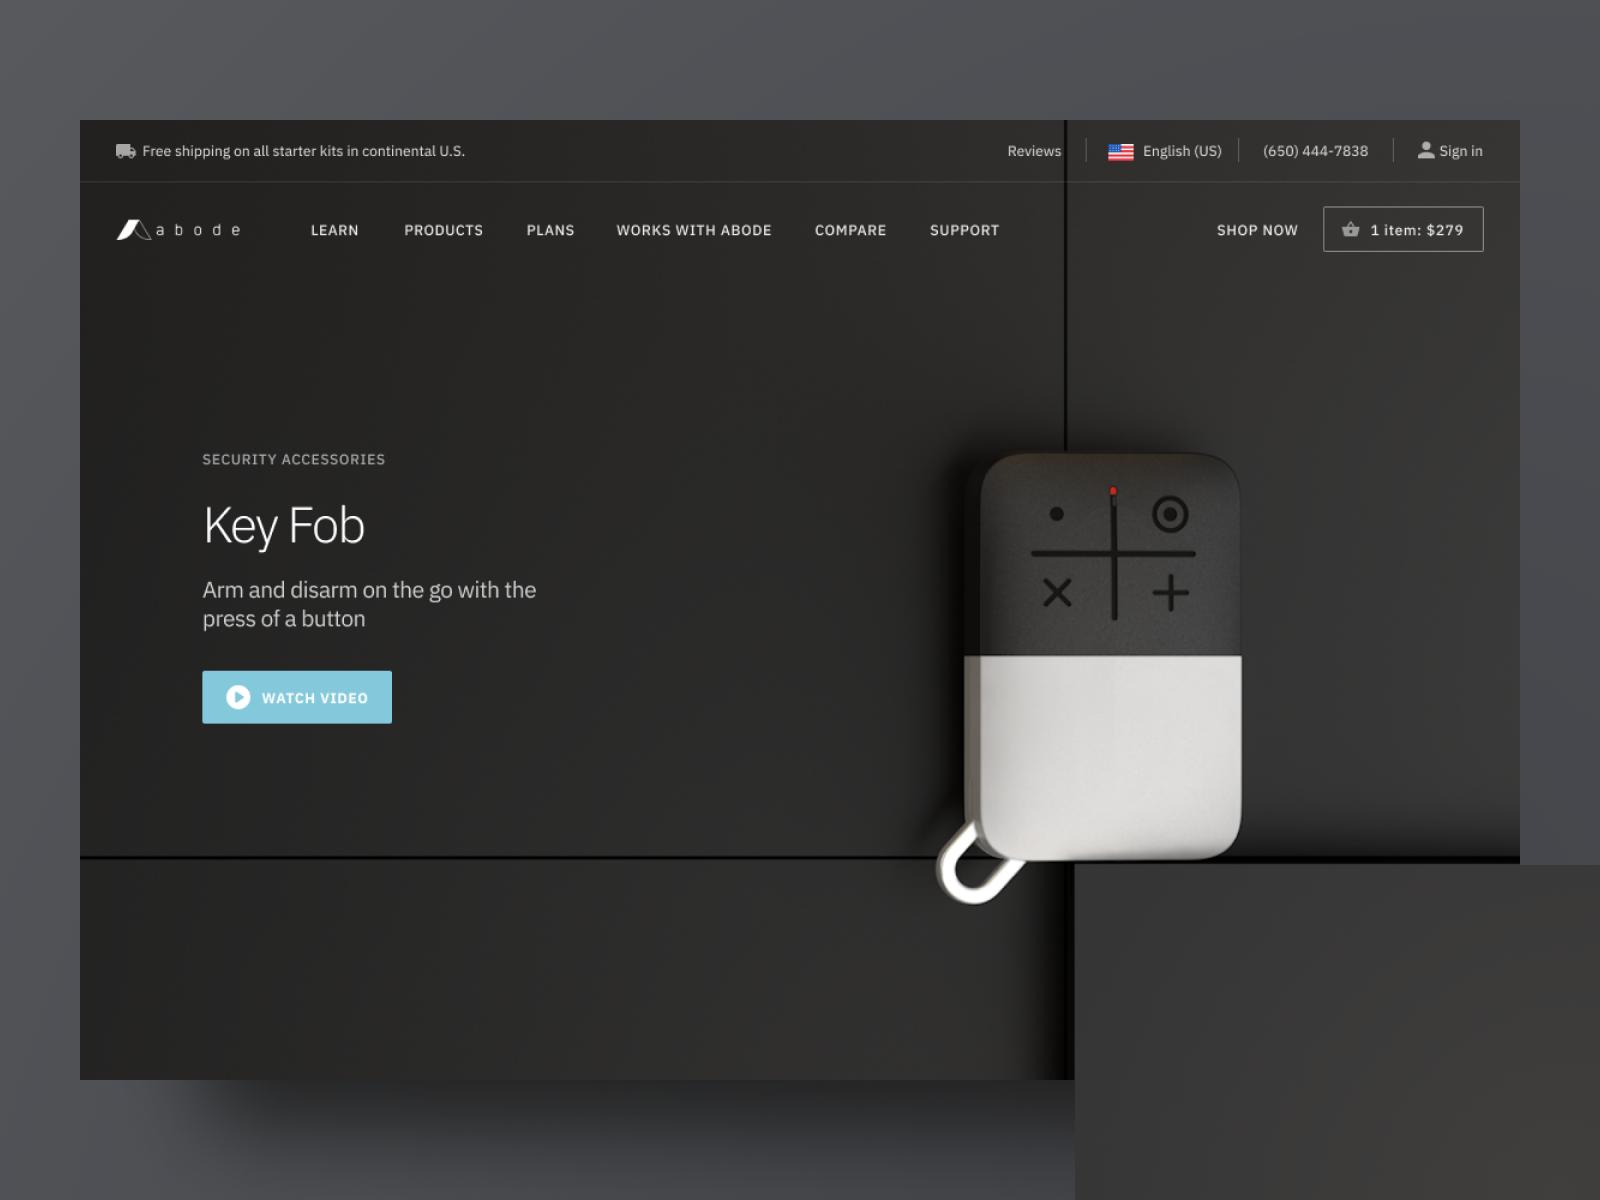 Abode – Product Page – Keyfob by eleken on Dribbble